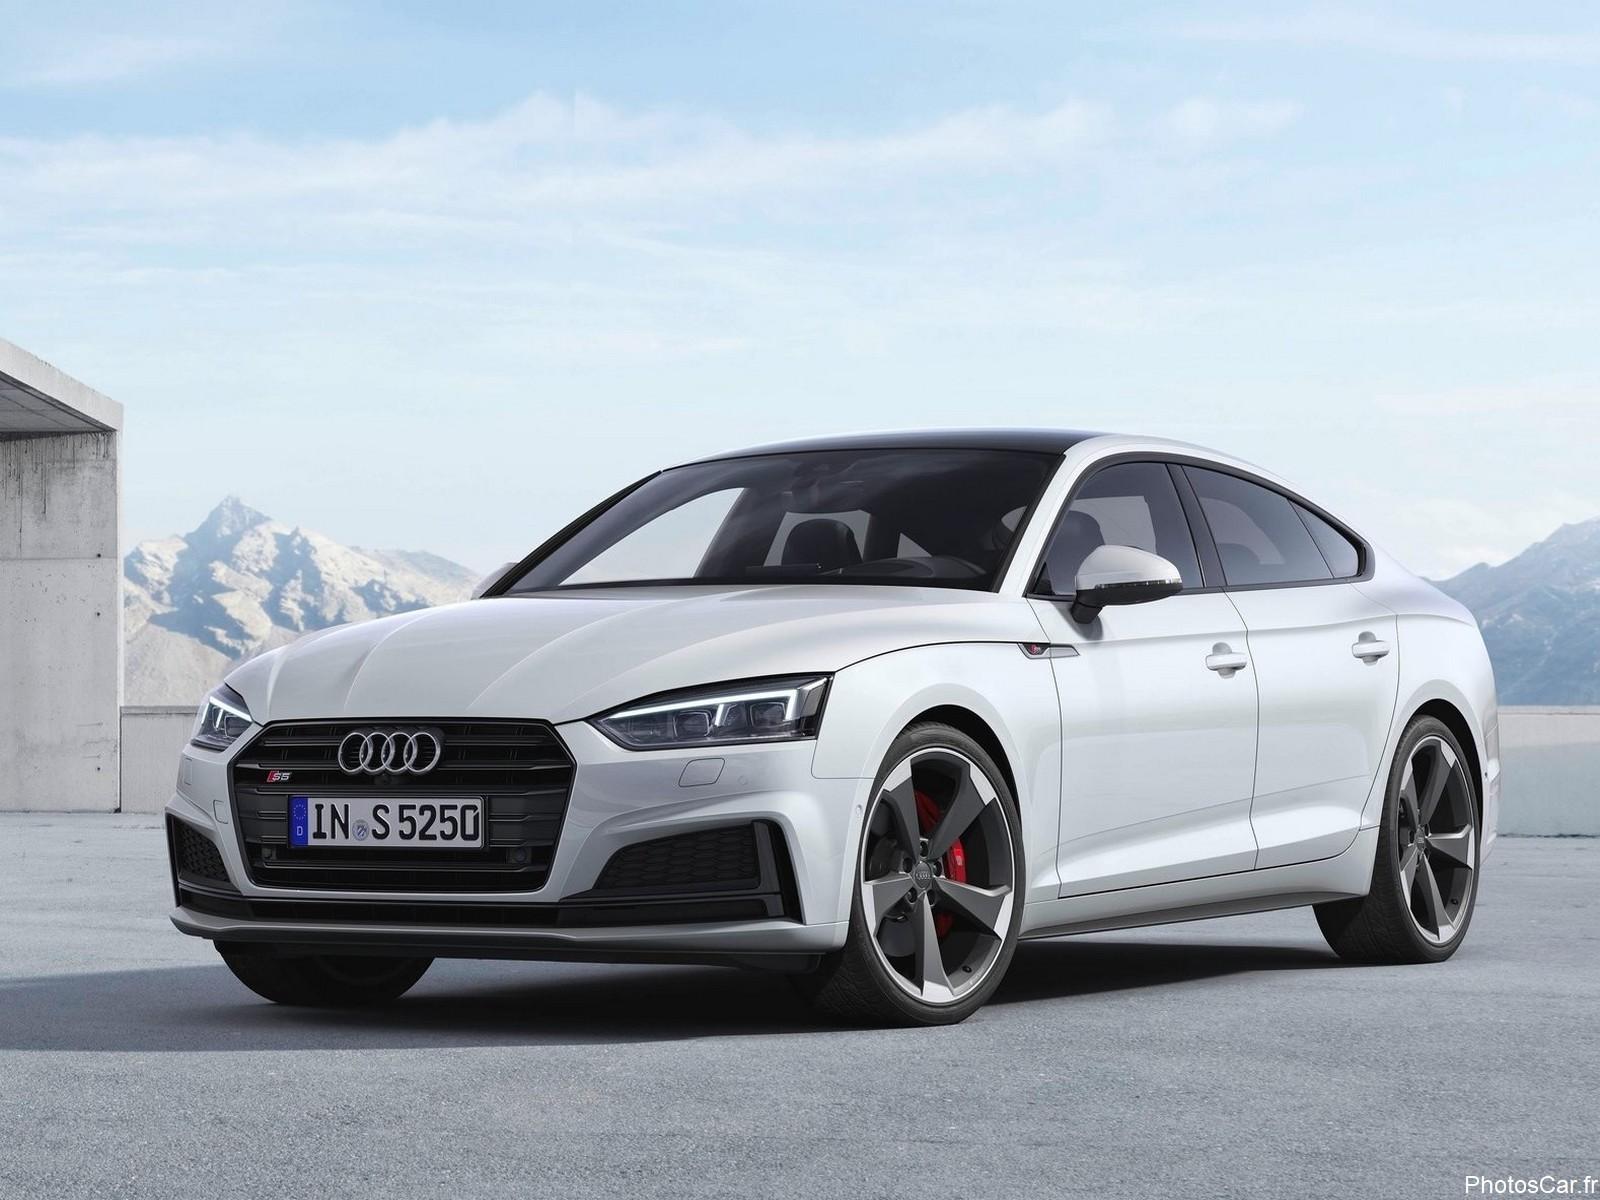 Audi S5 Sportback TDI 2019